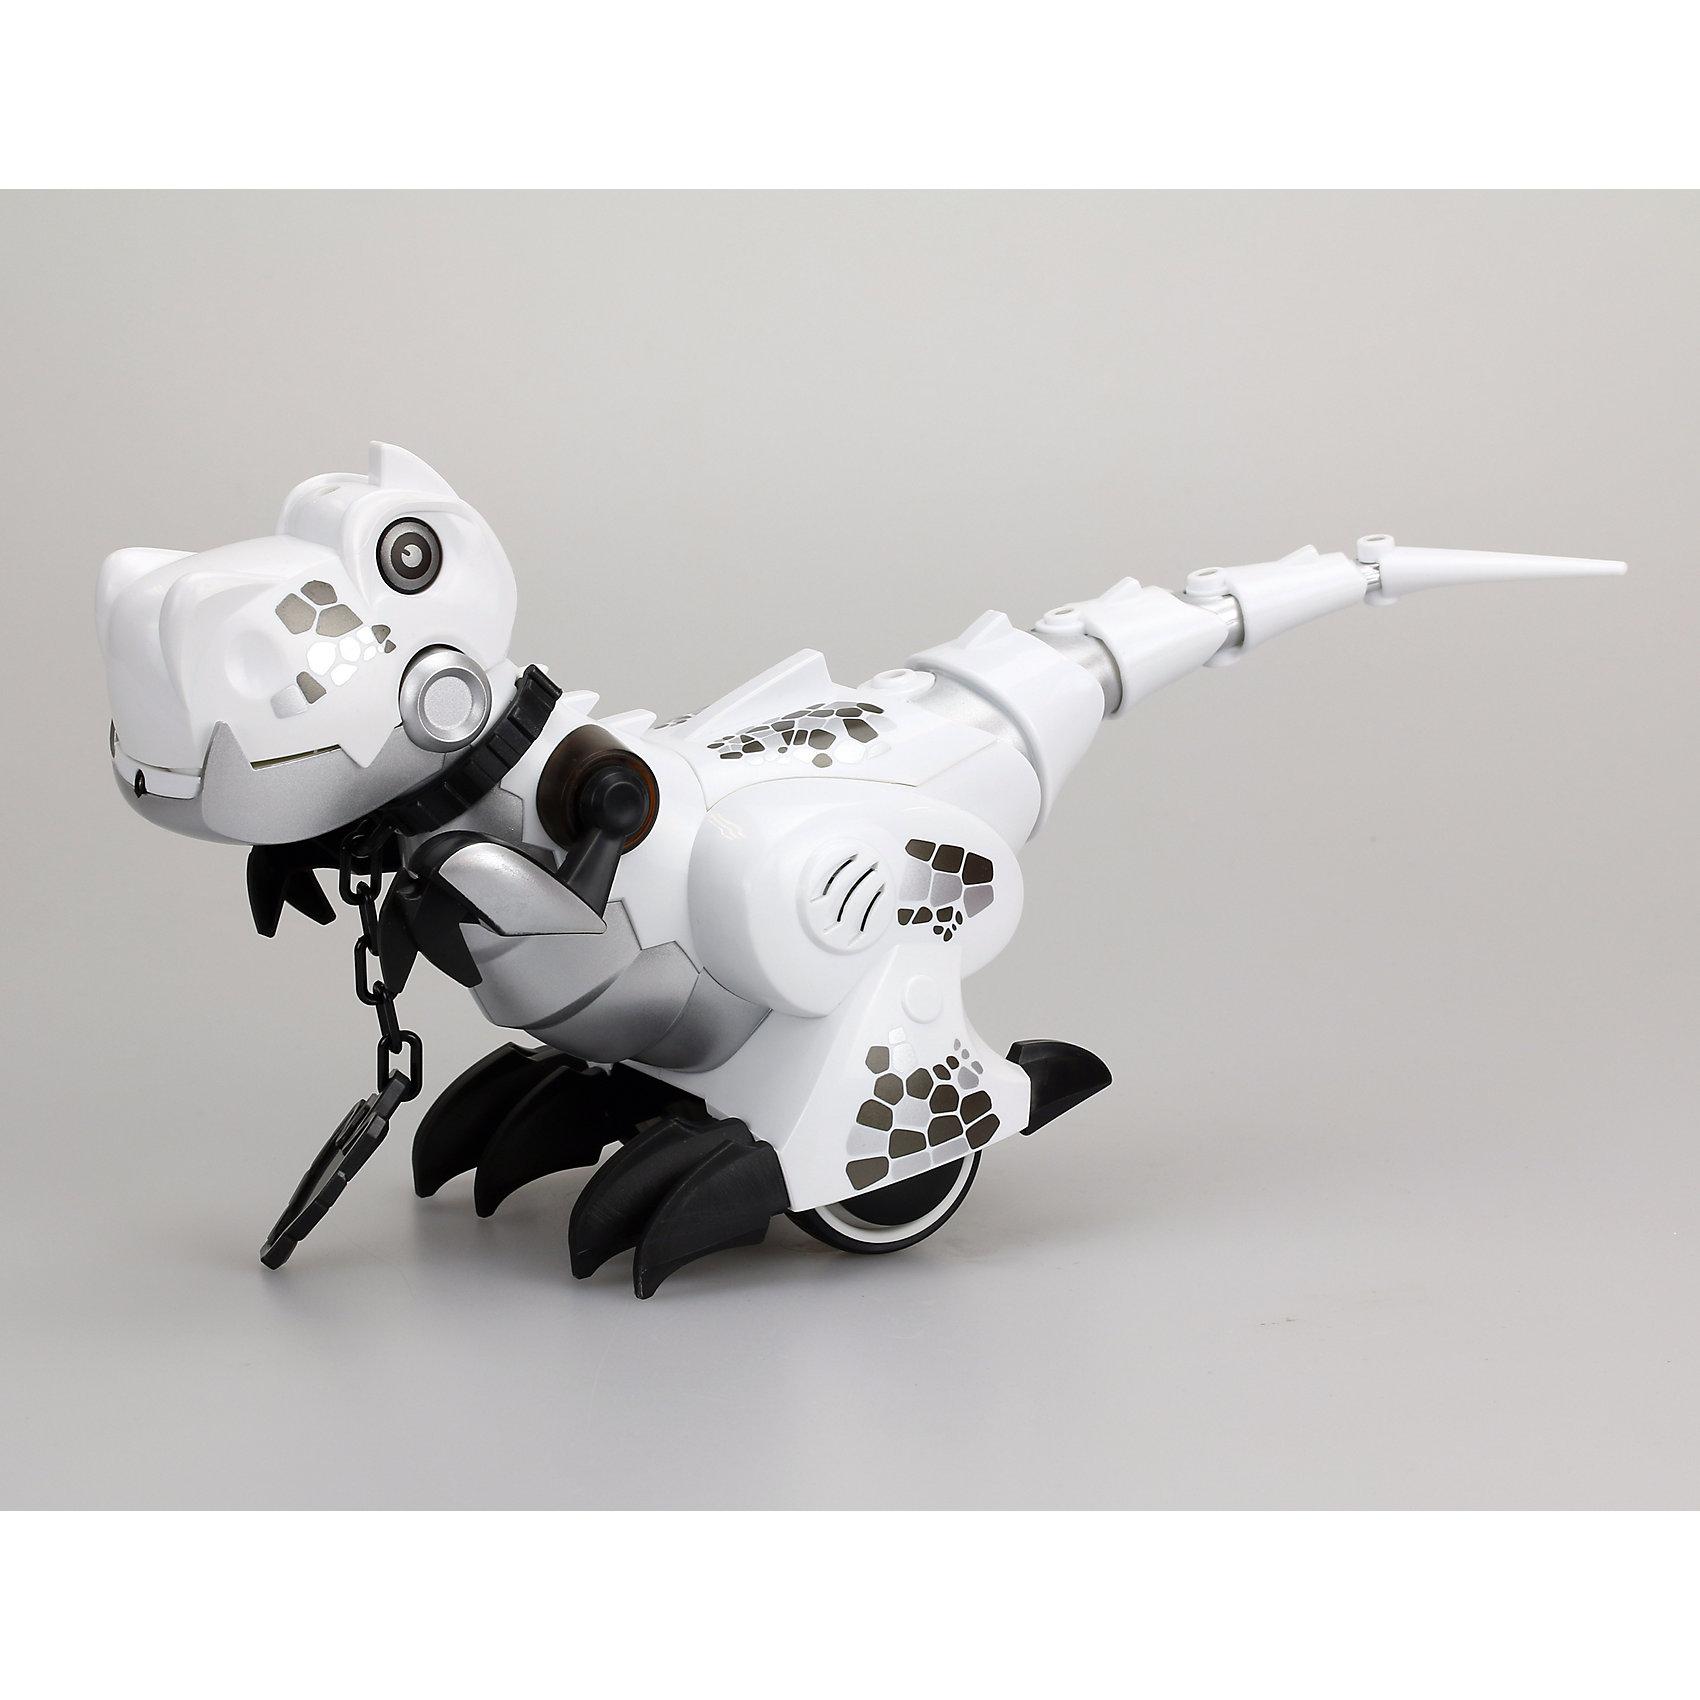 Приручи Динозавра, Silverlit, белыйРоботы<br><br><br>Ширина мм: 215<br>Глубина мм: 152<br>Высота мм: 342<br>Вес г: 760<br>Возраст от месяцев: 36<br>Возраст до месяцев: 84<br>Пол: Унисекс<br>Возраст: Детский<br>SKU: 5631990